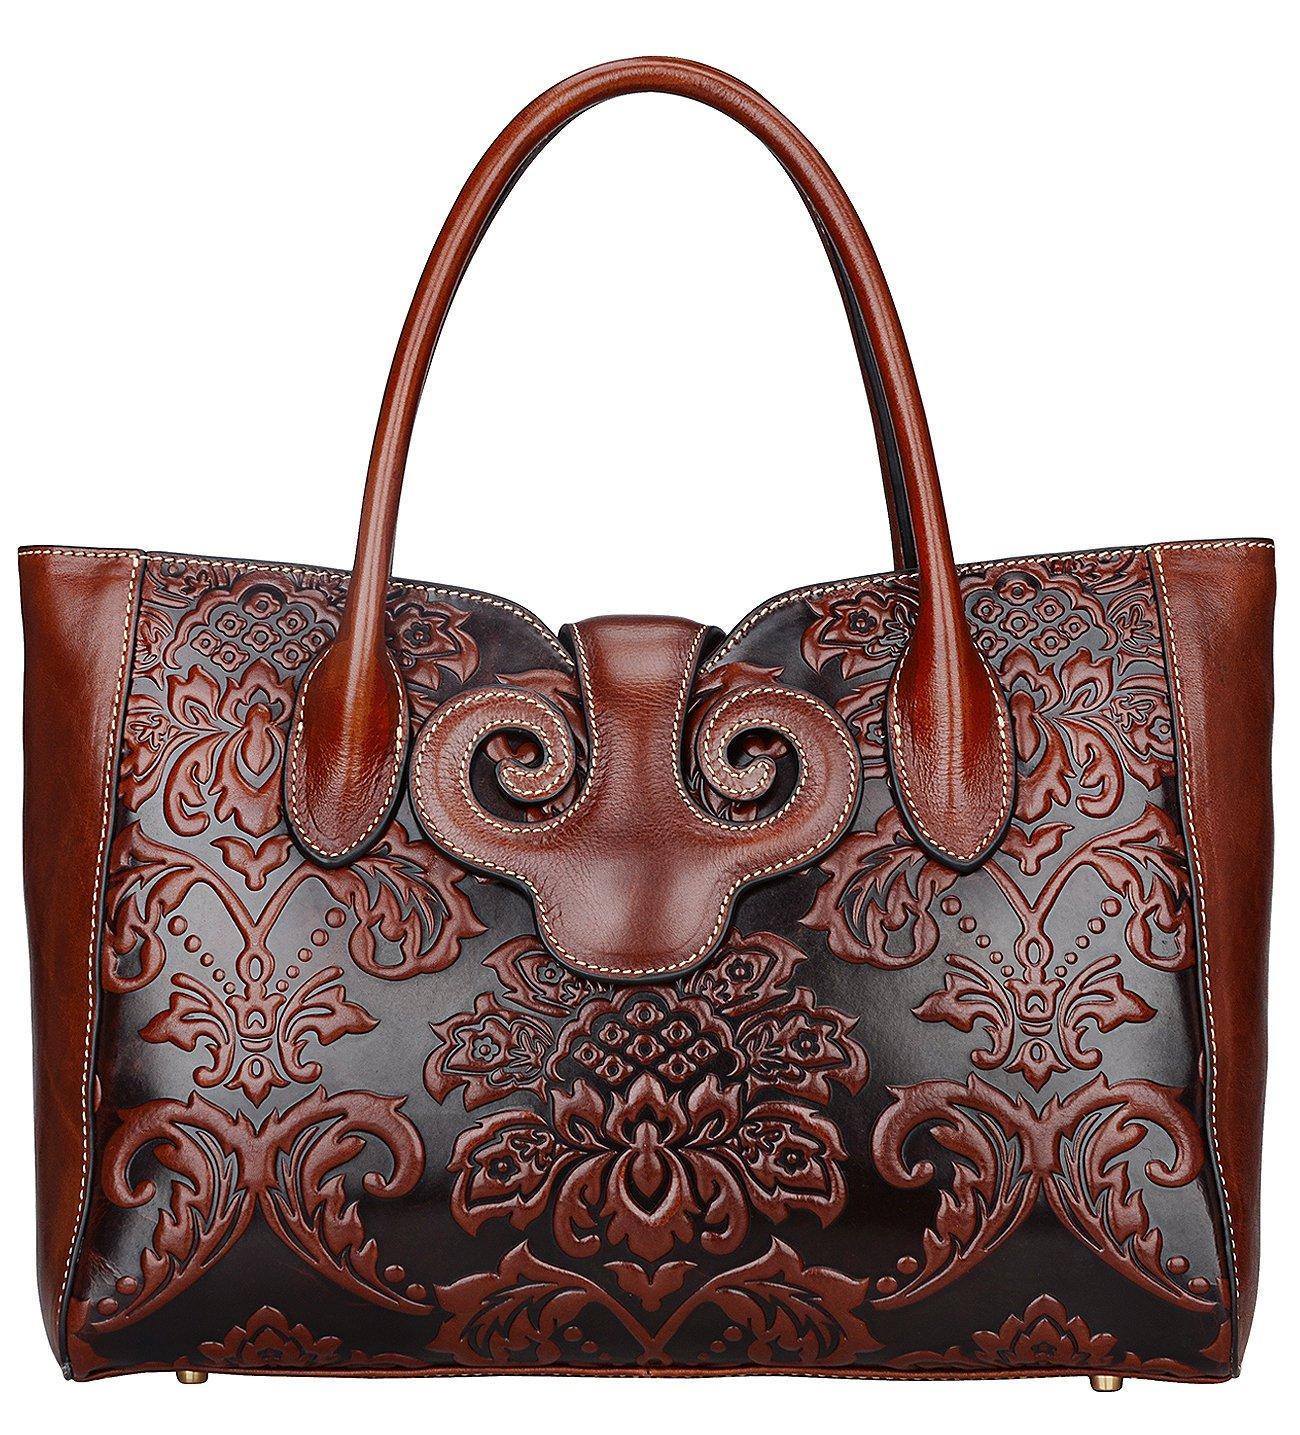 PIJUSHI Floral Handbags for Women Designer Handbag Top Handle Shoulder Bags for Ladies (91776 Brown)